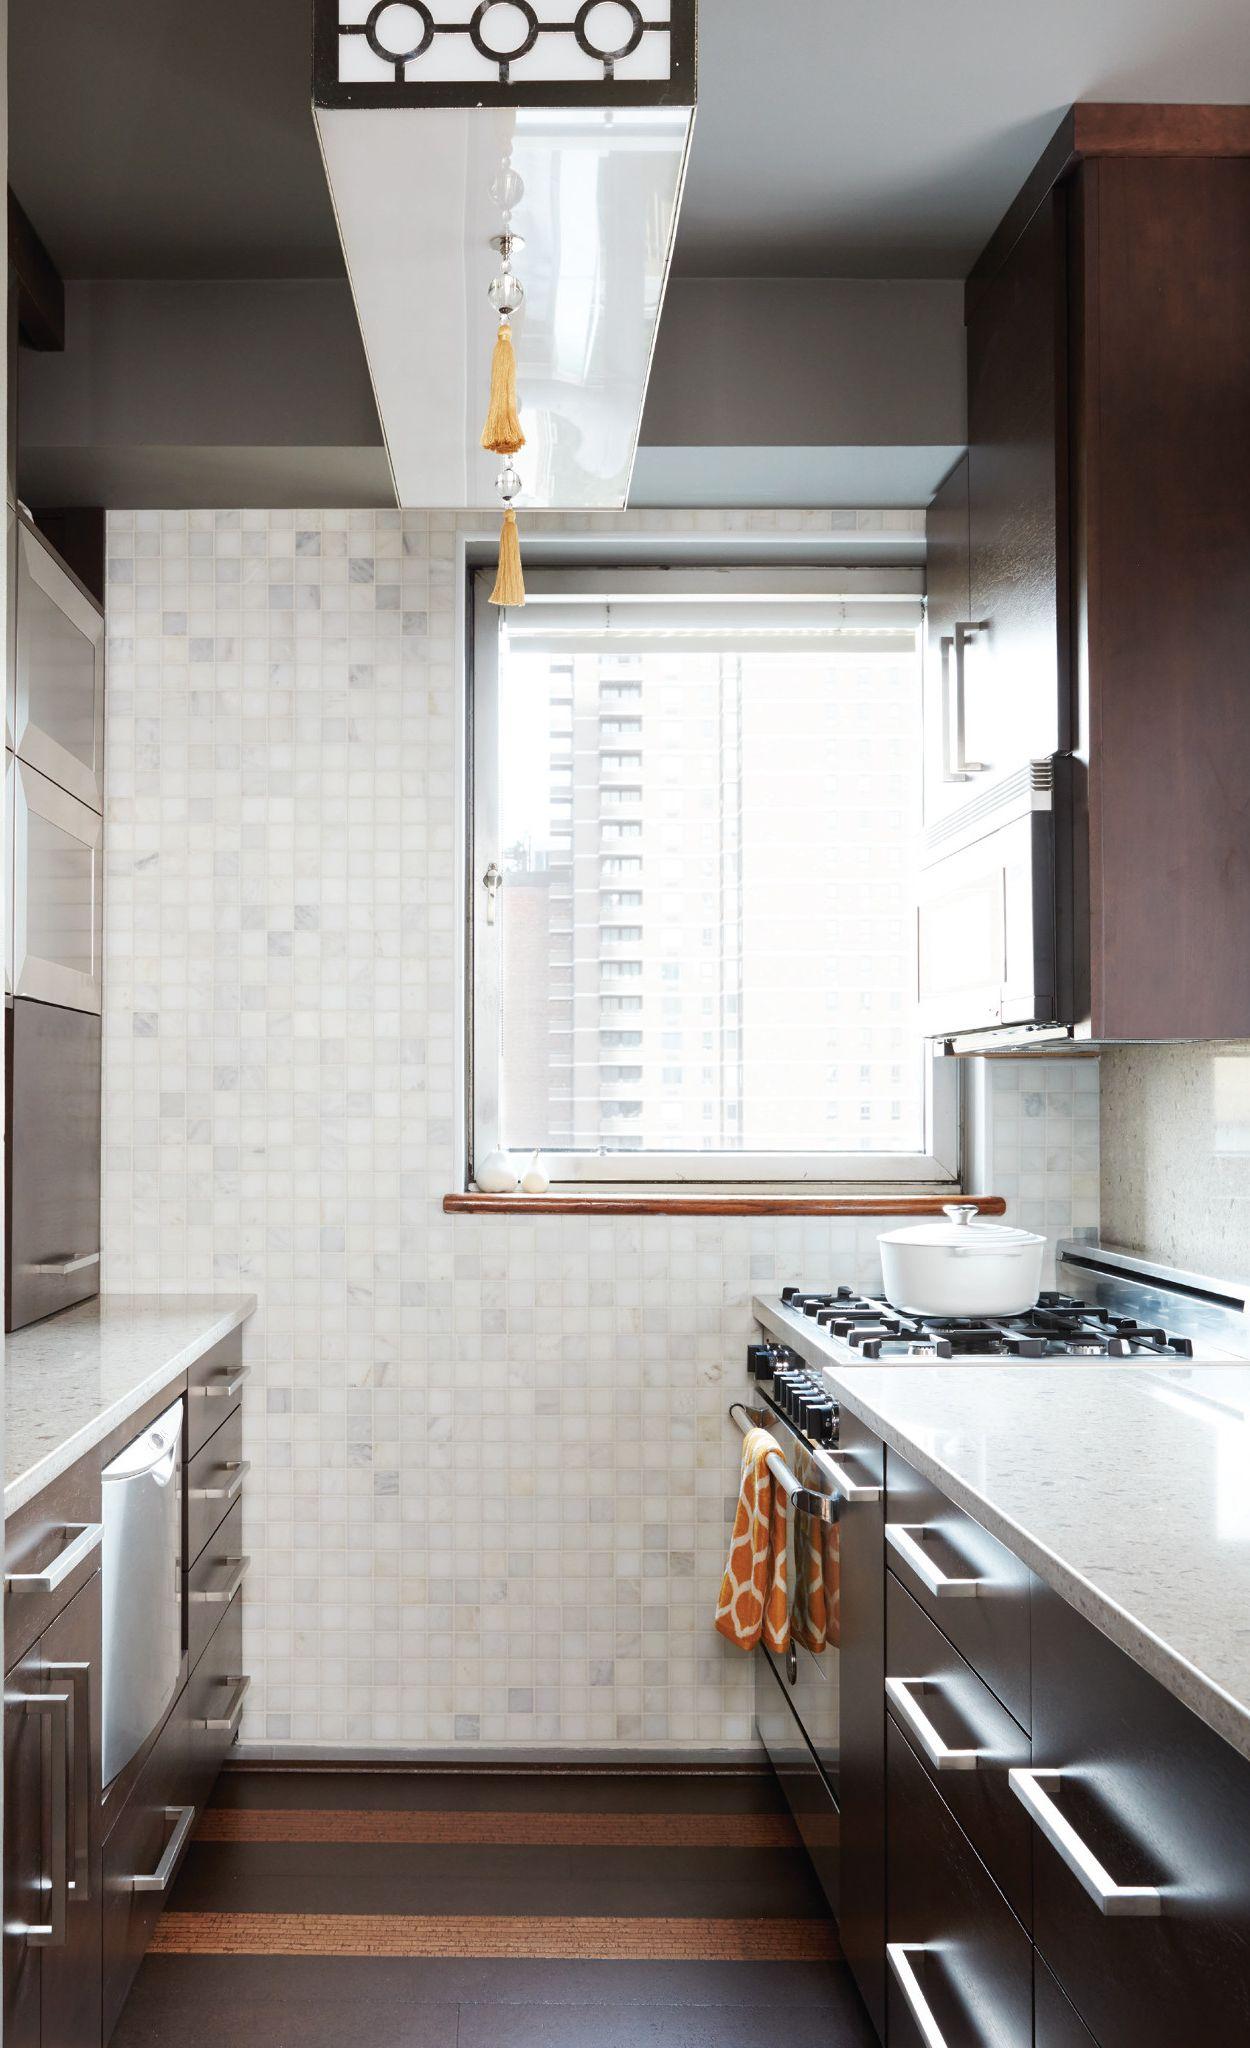 Cambria Darlington with espresso cabinets in a galley kitchen.